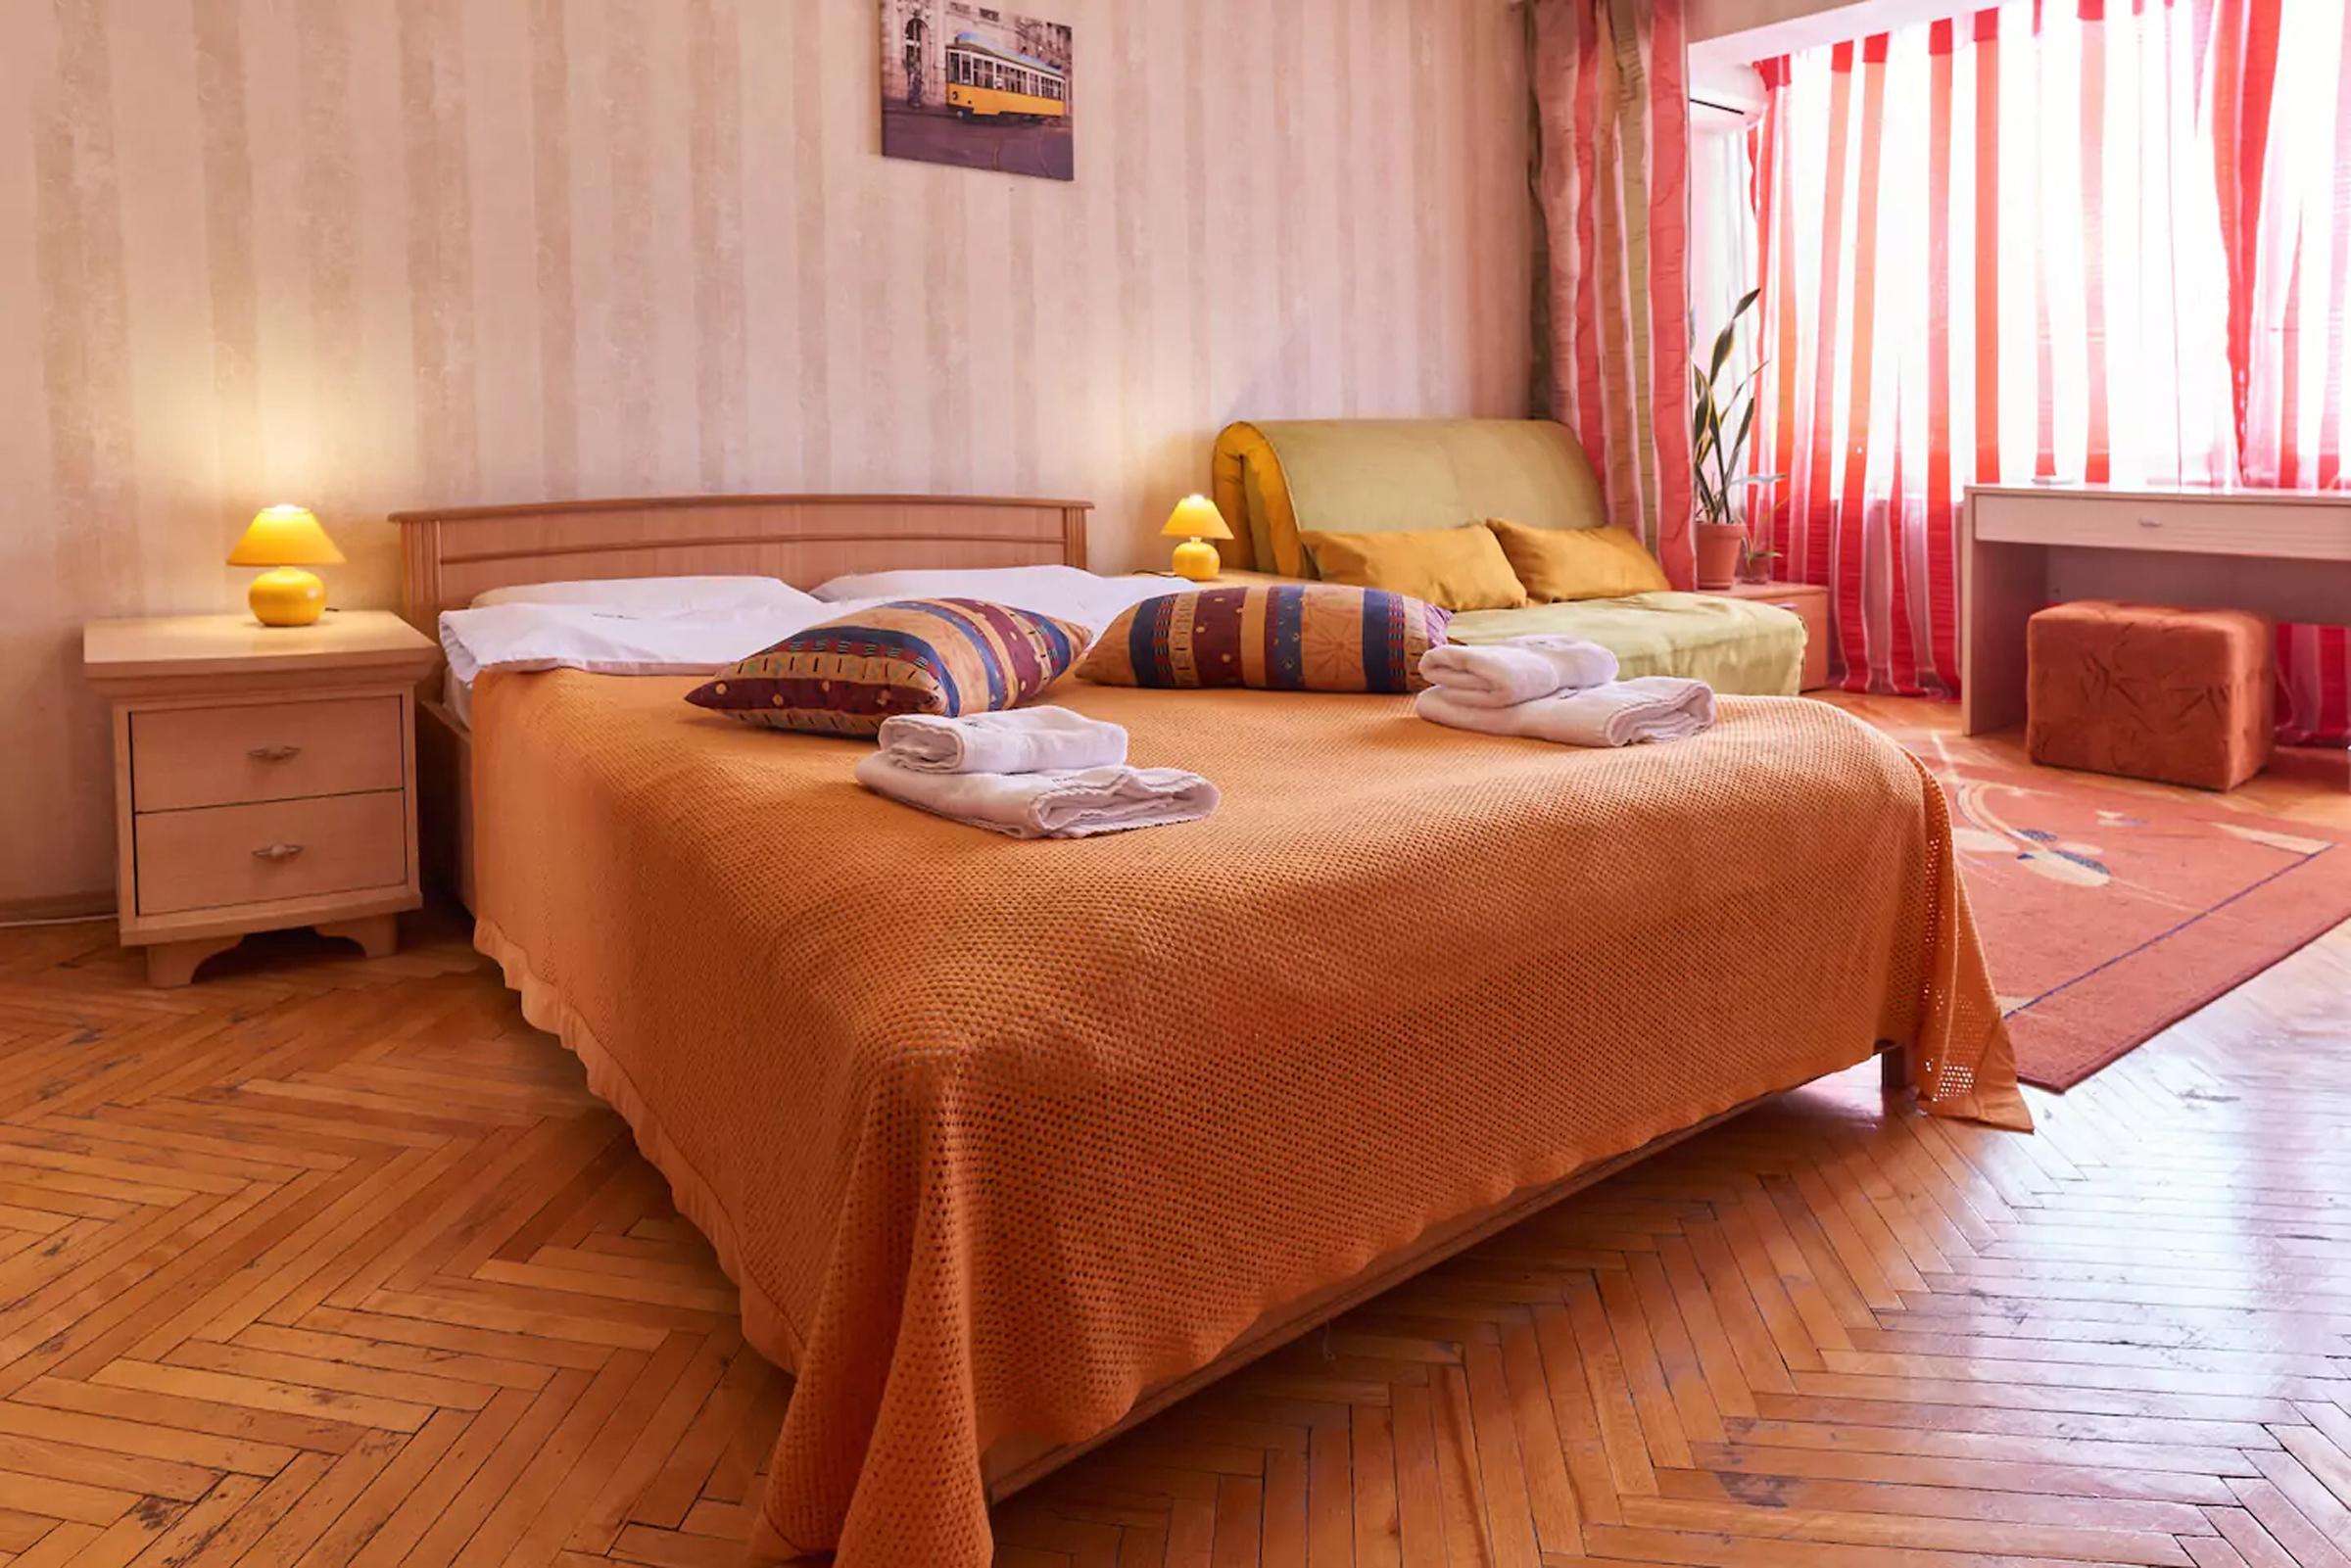 Apartment for rent in Kiev Raisy Okipnoy 7